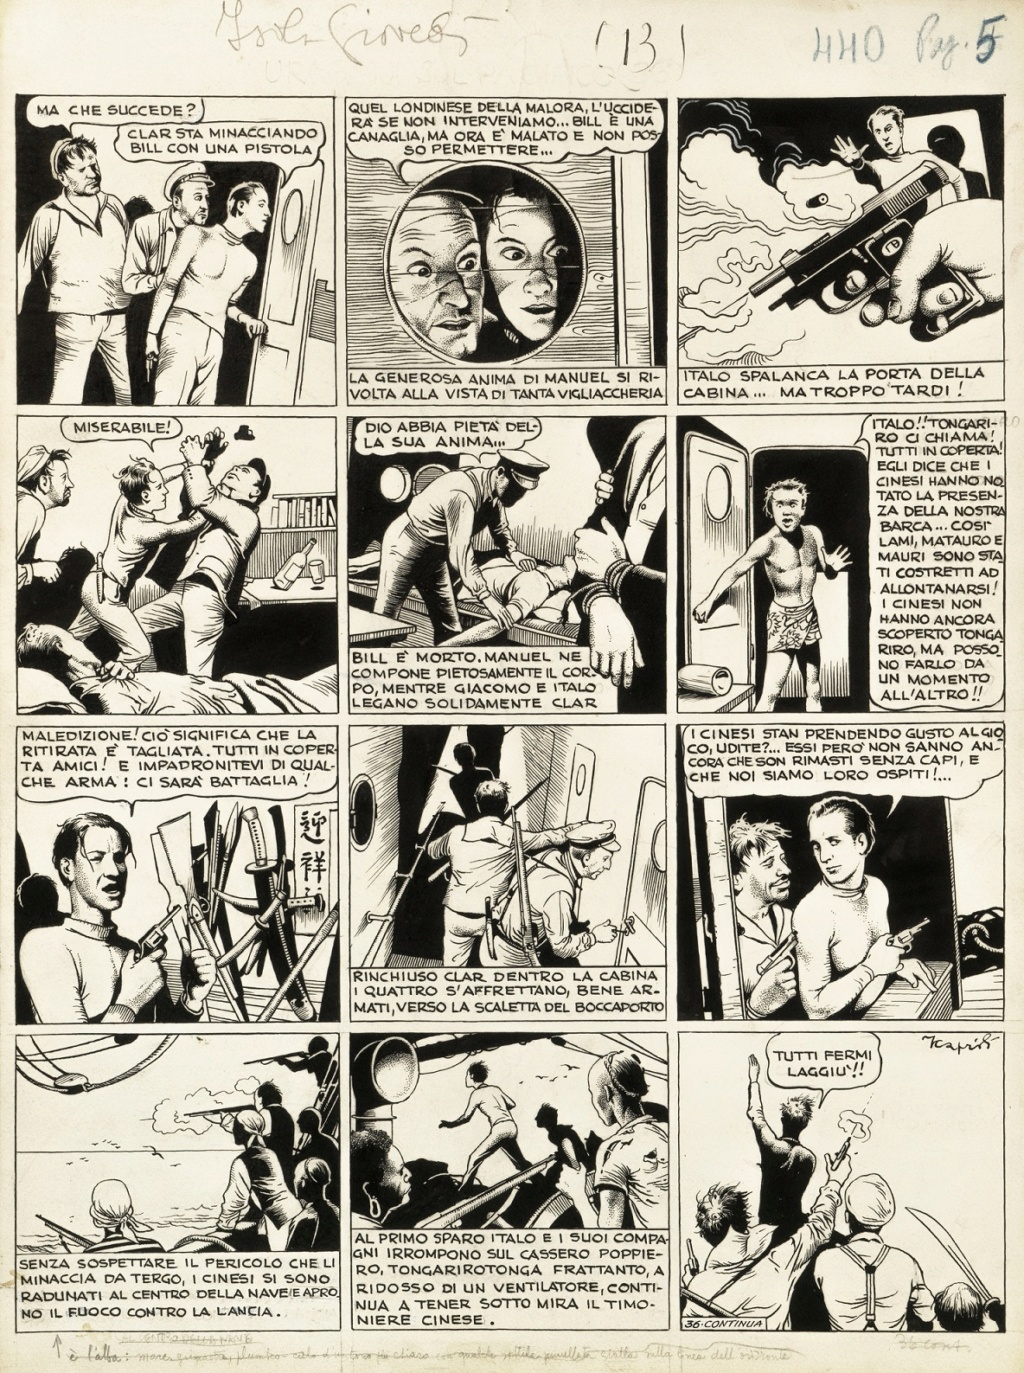 Bandes dessinées italiennes - Page 16 Caprio10